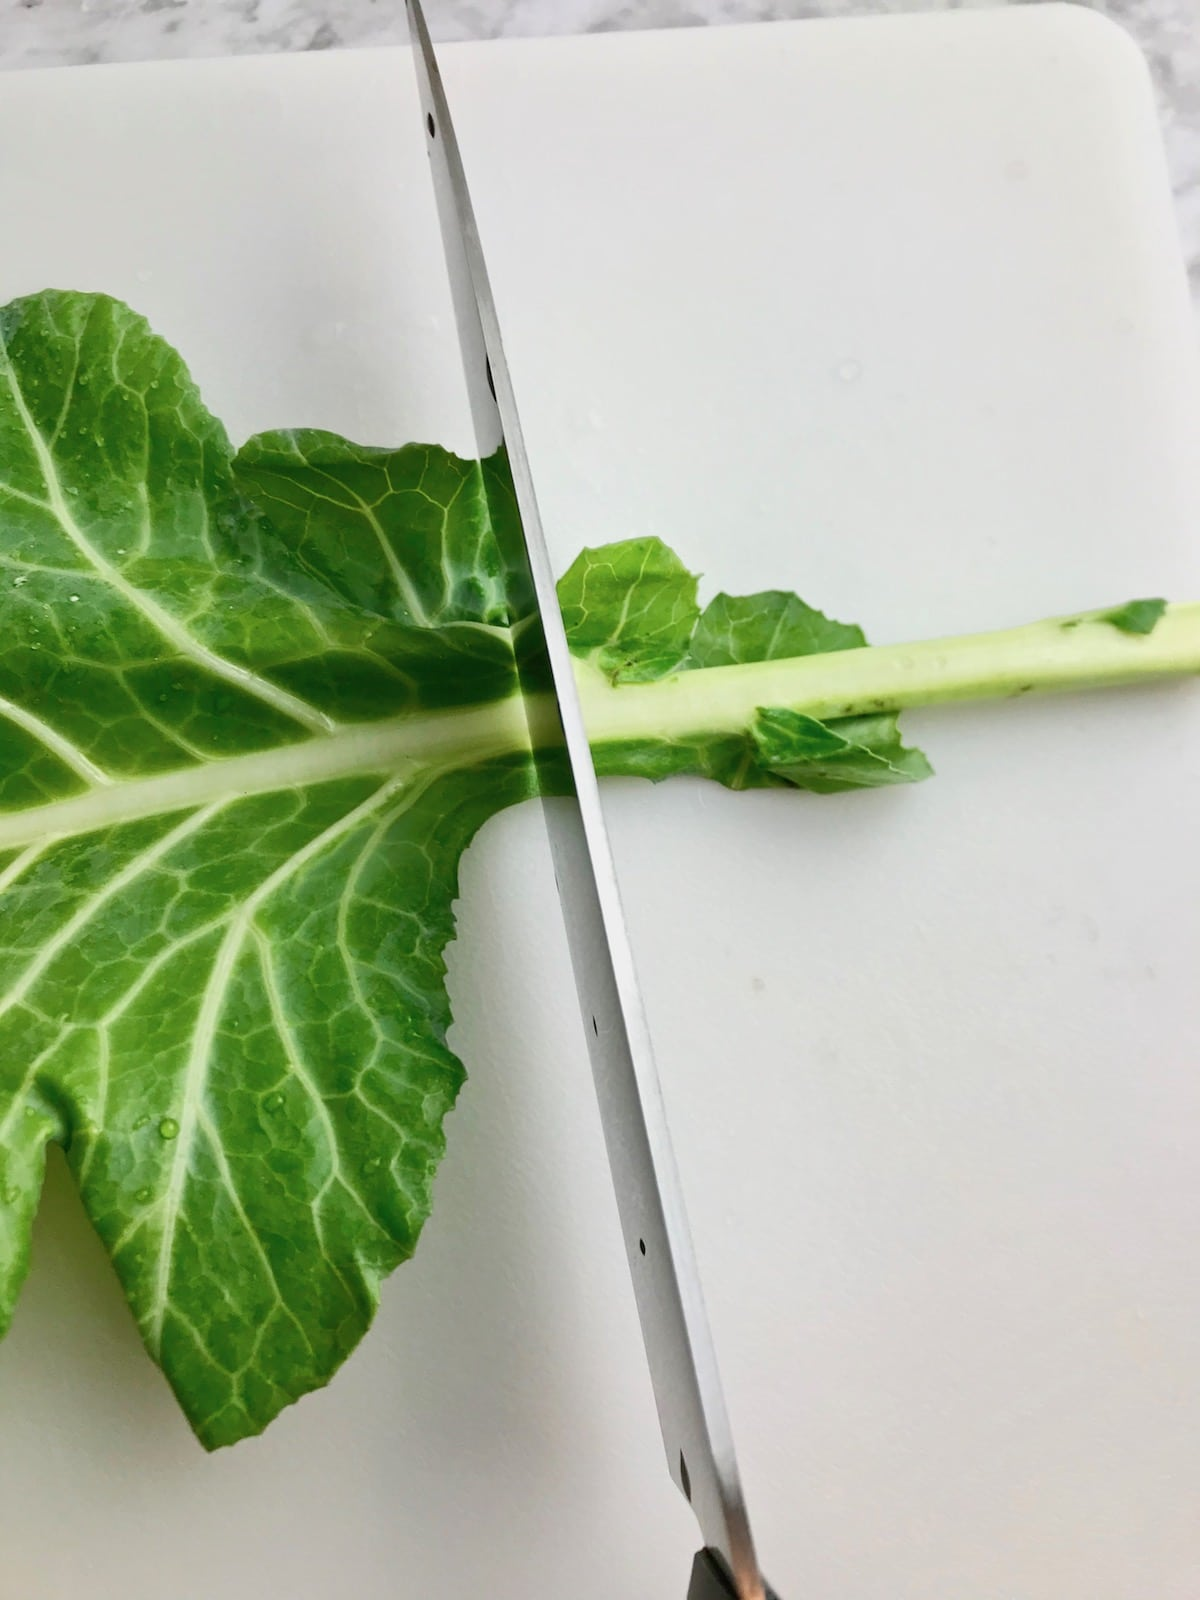 A knife cutting the stem off of a collard leaf.